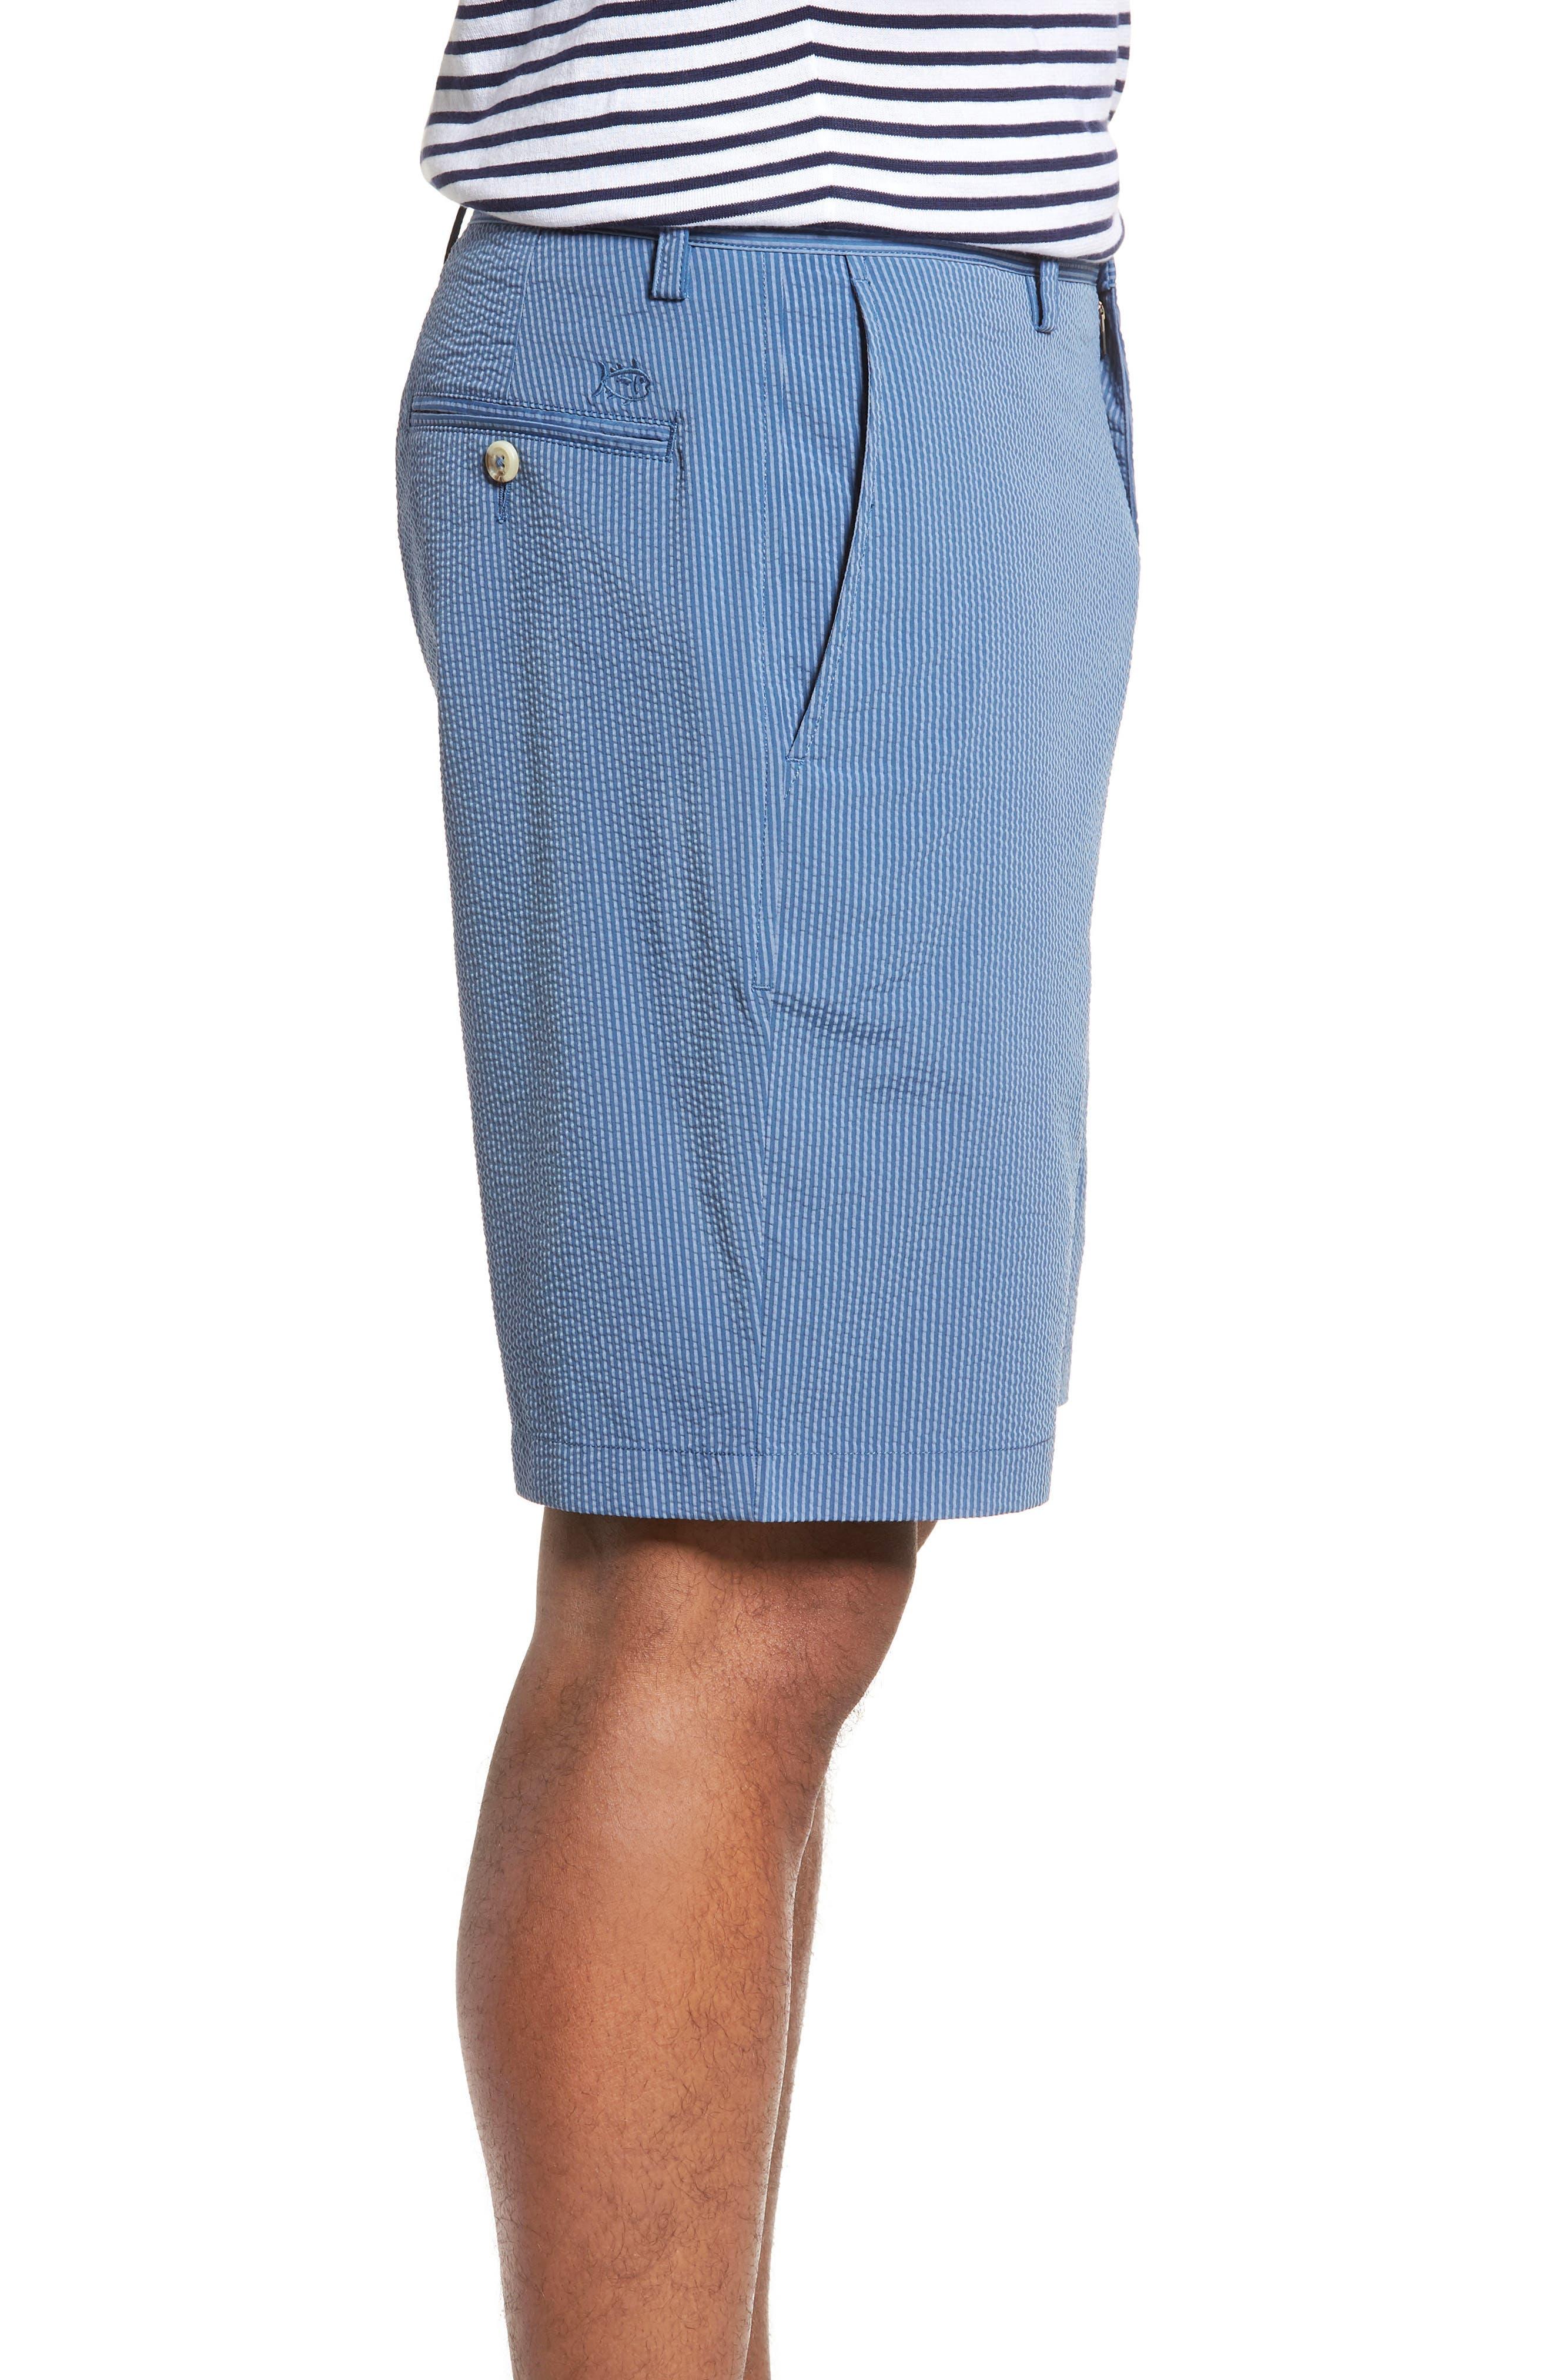 Seersucker Shorts,                             Alternate thumbnail 3, color,                             425